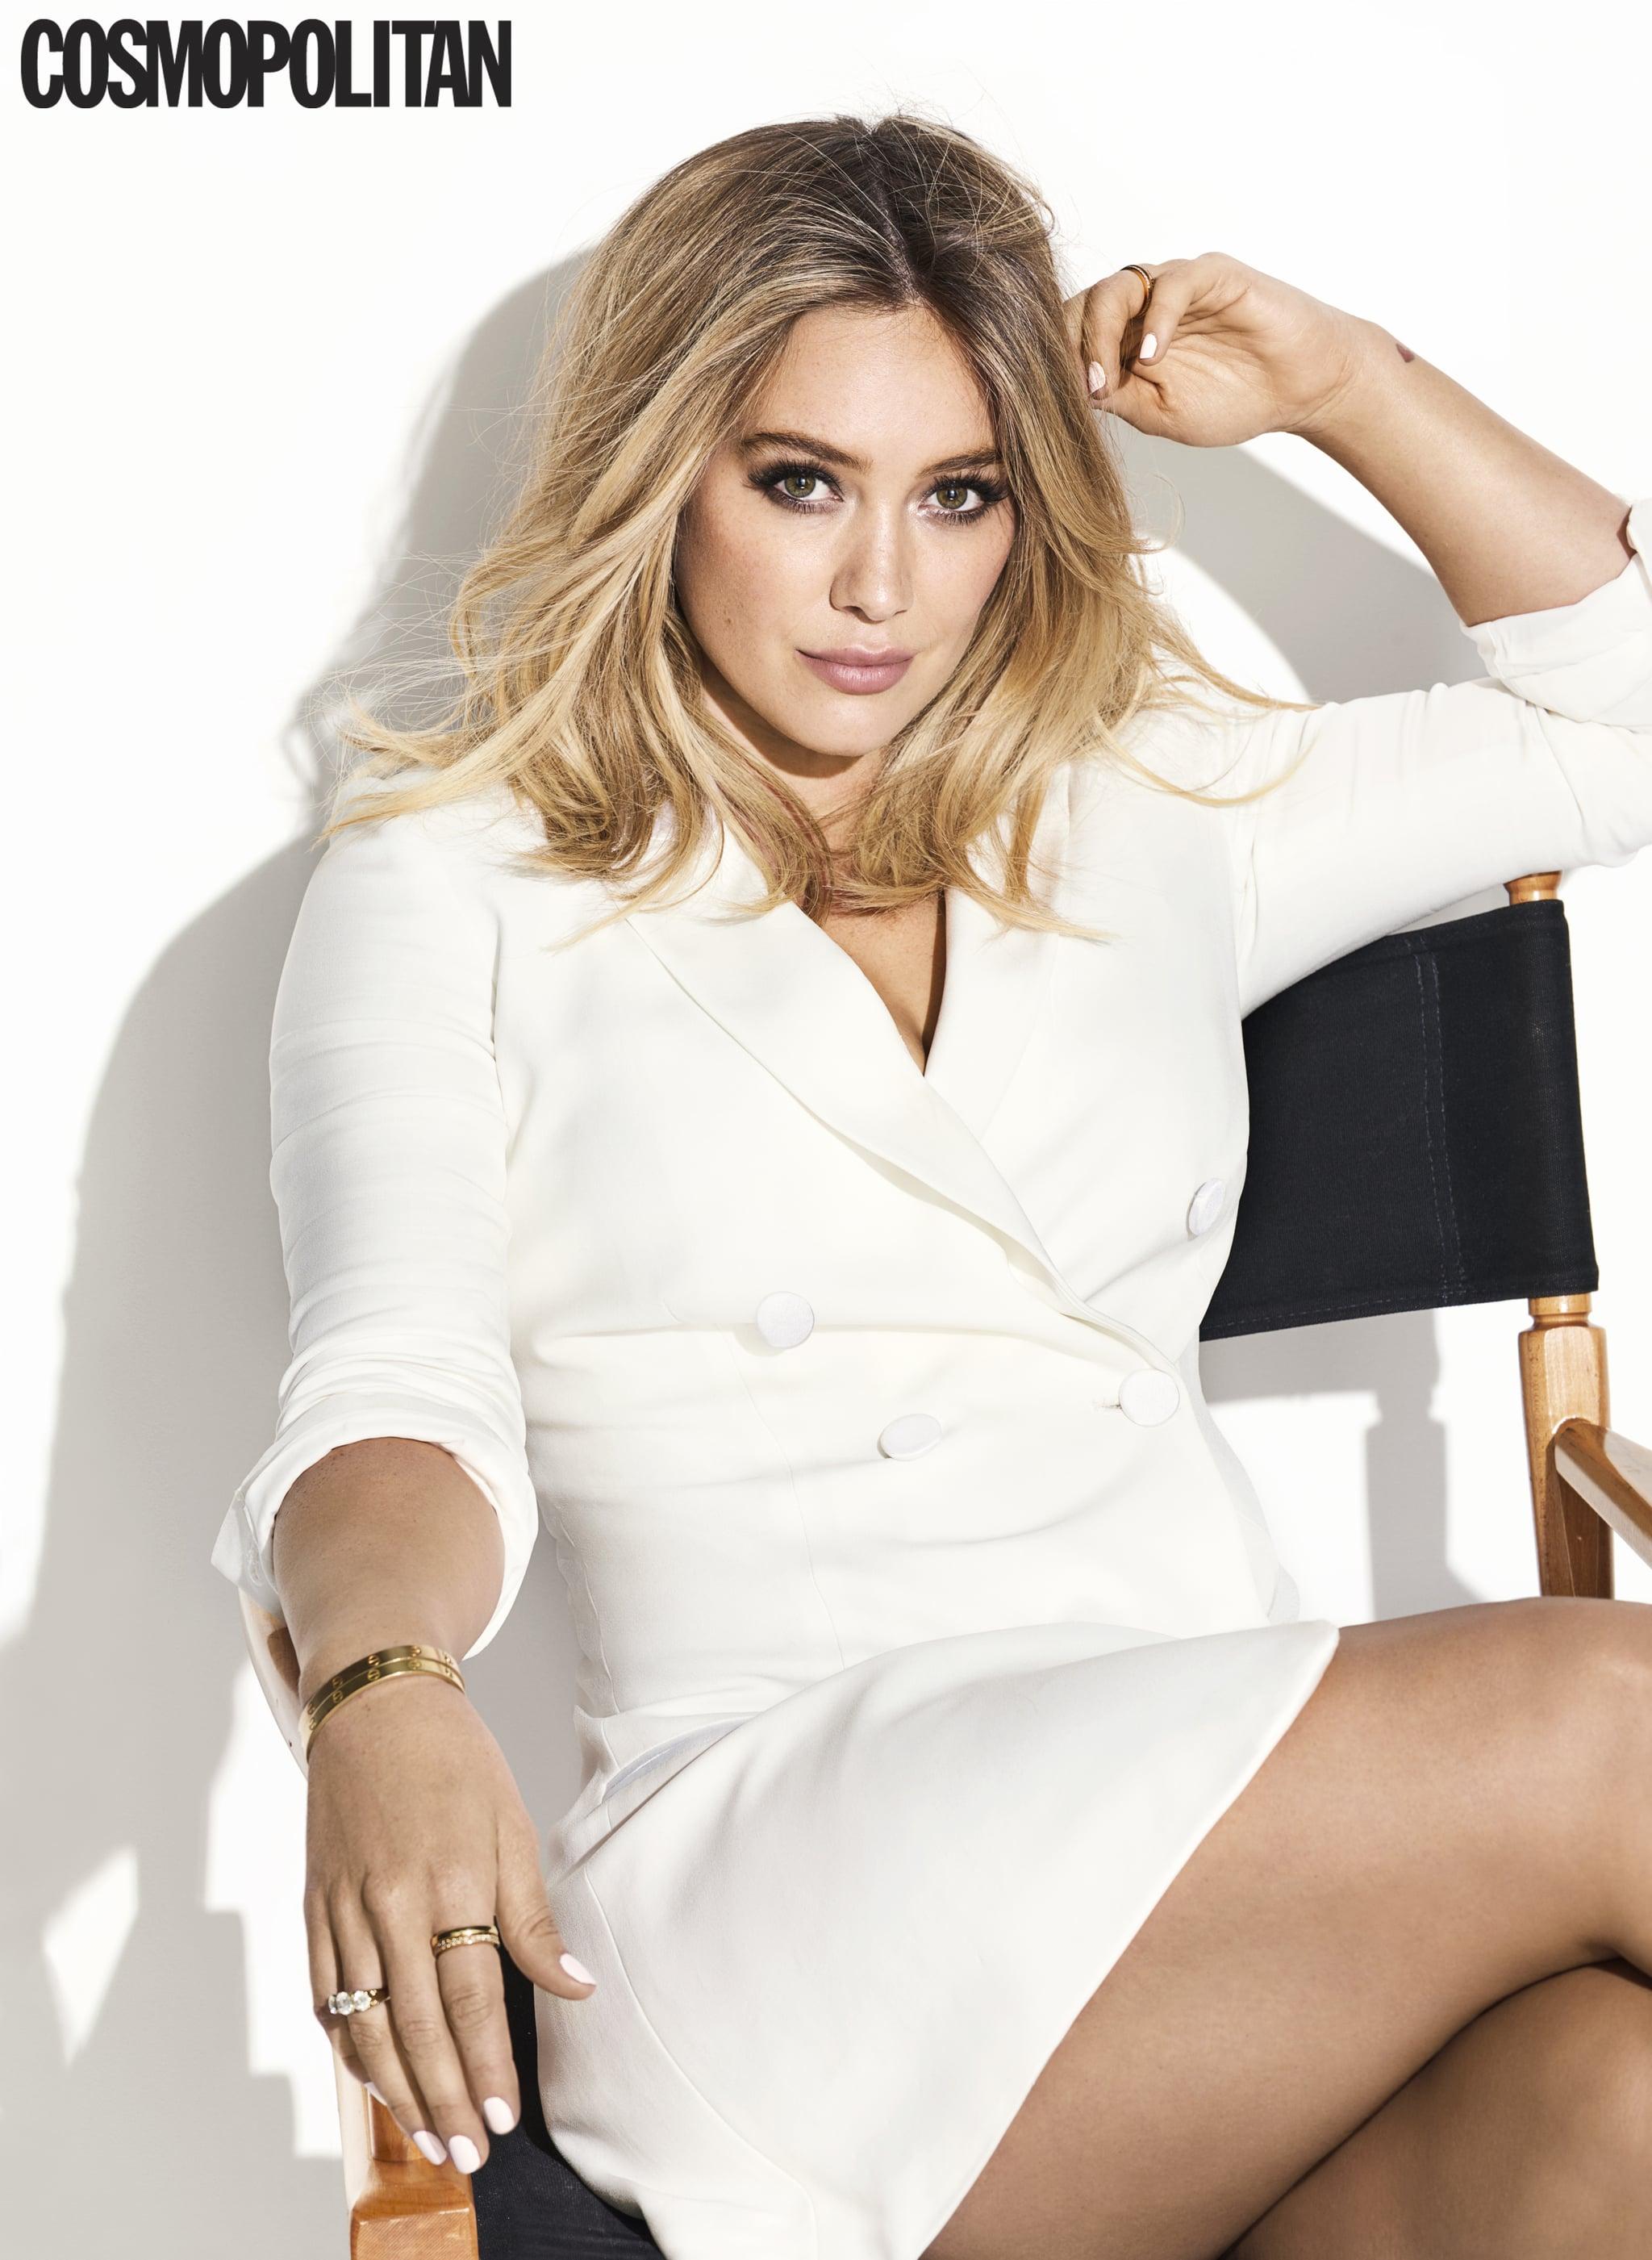 Hilary Duff on Cosmopo... Hilary Duff Movies